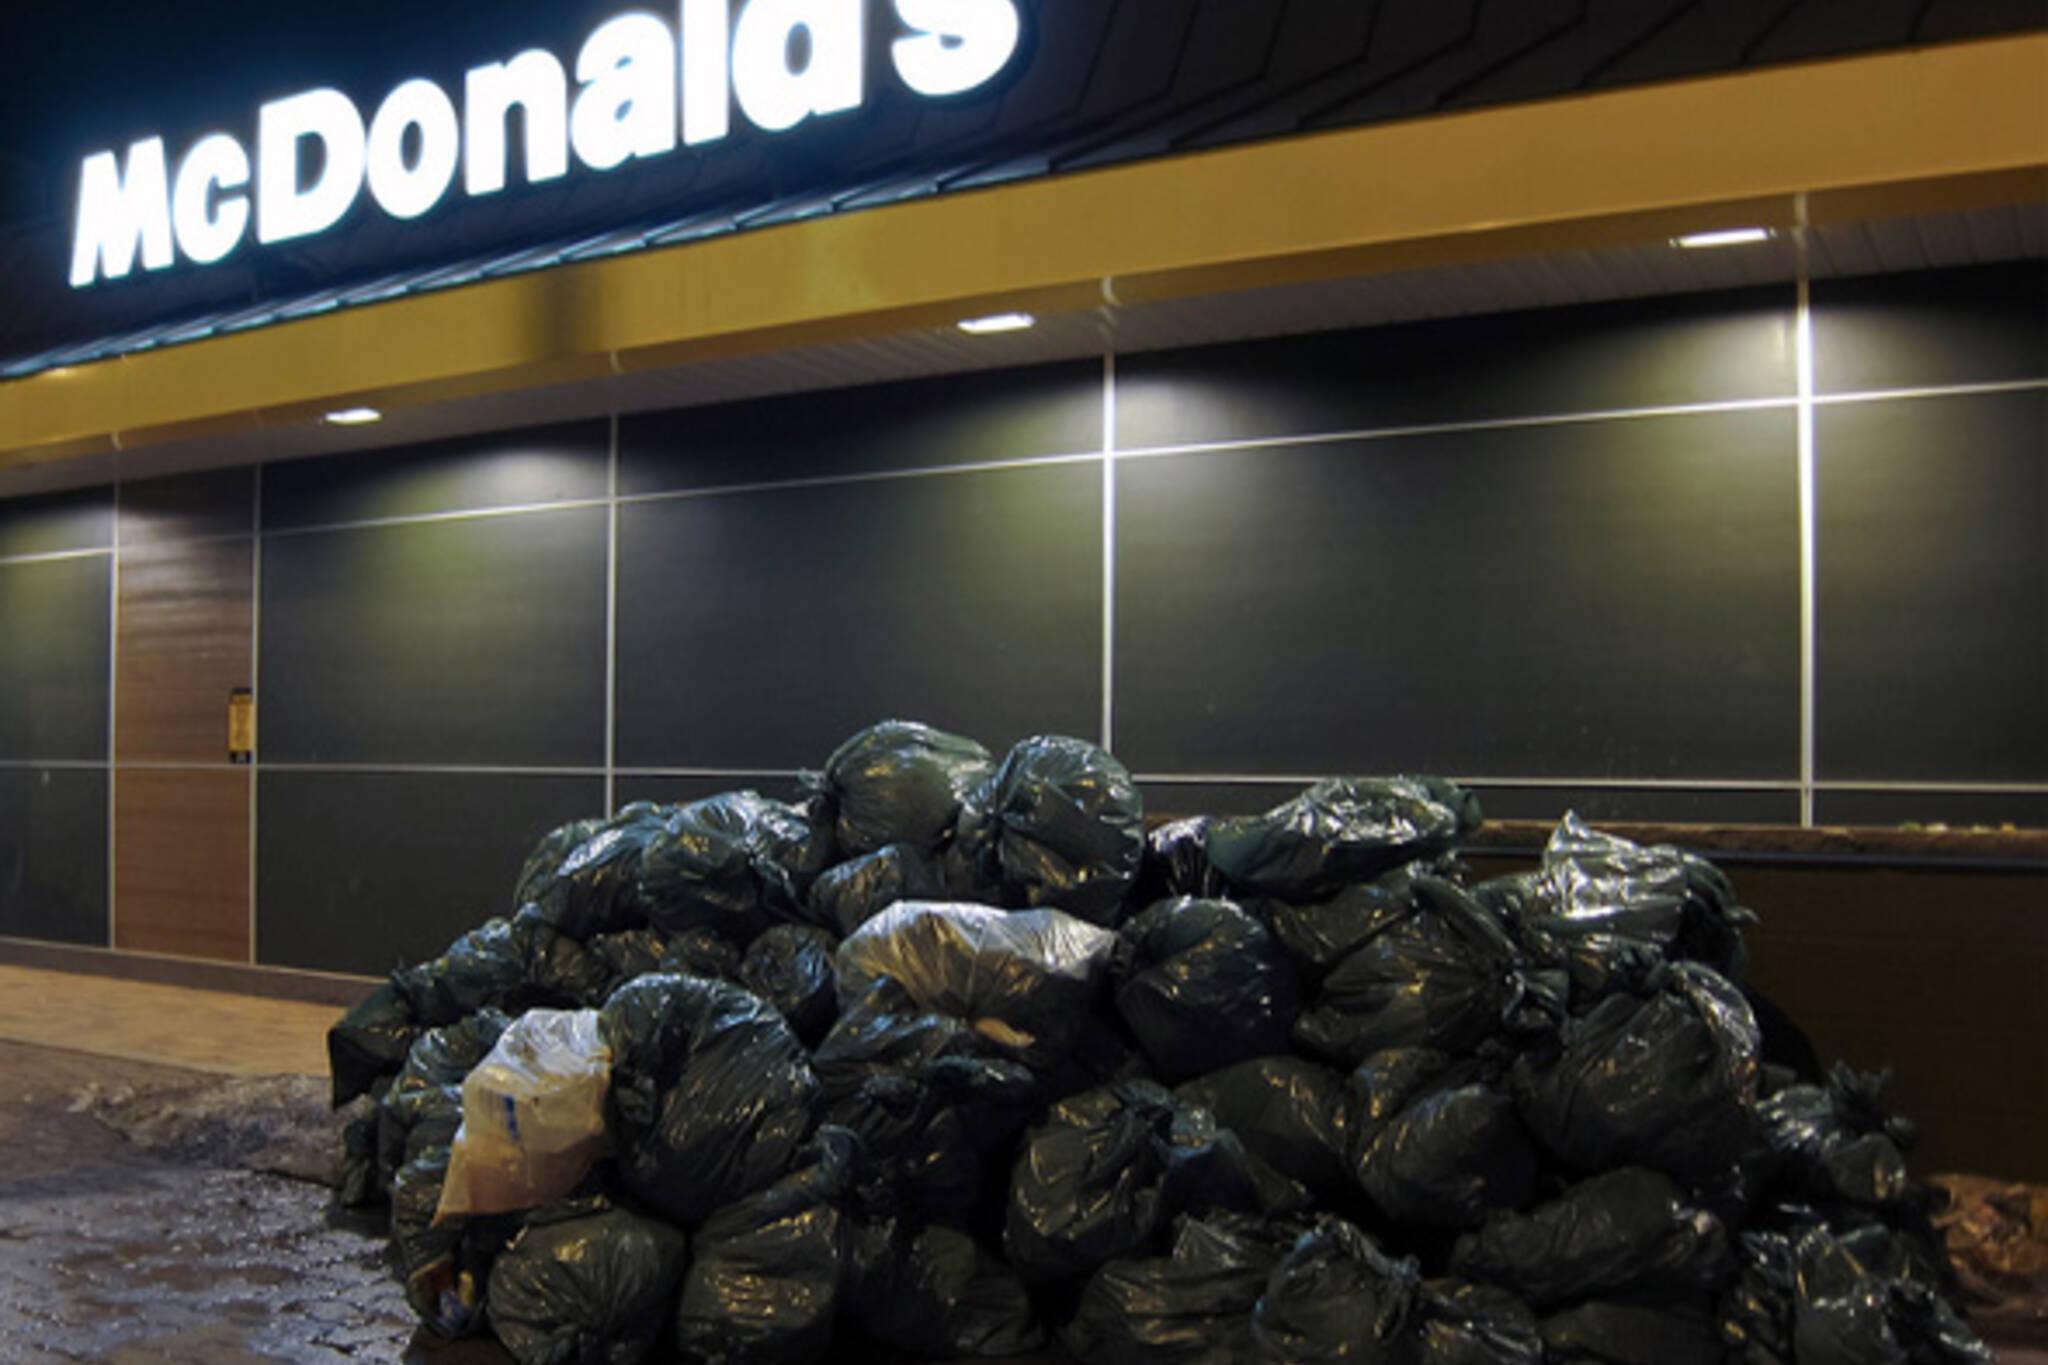 McDonald's Garbage